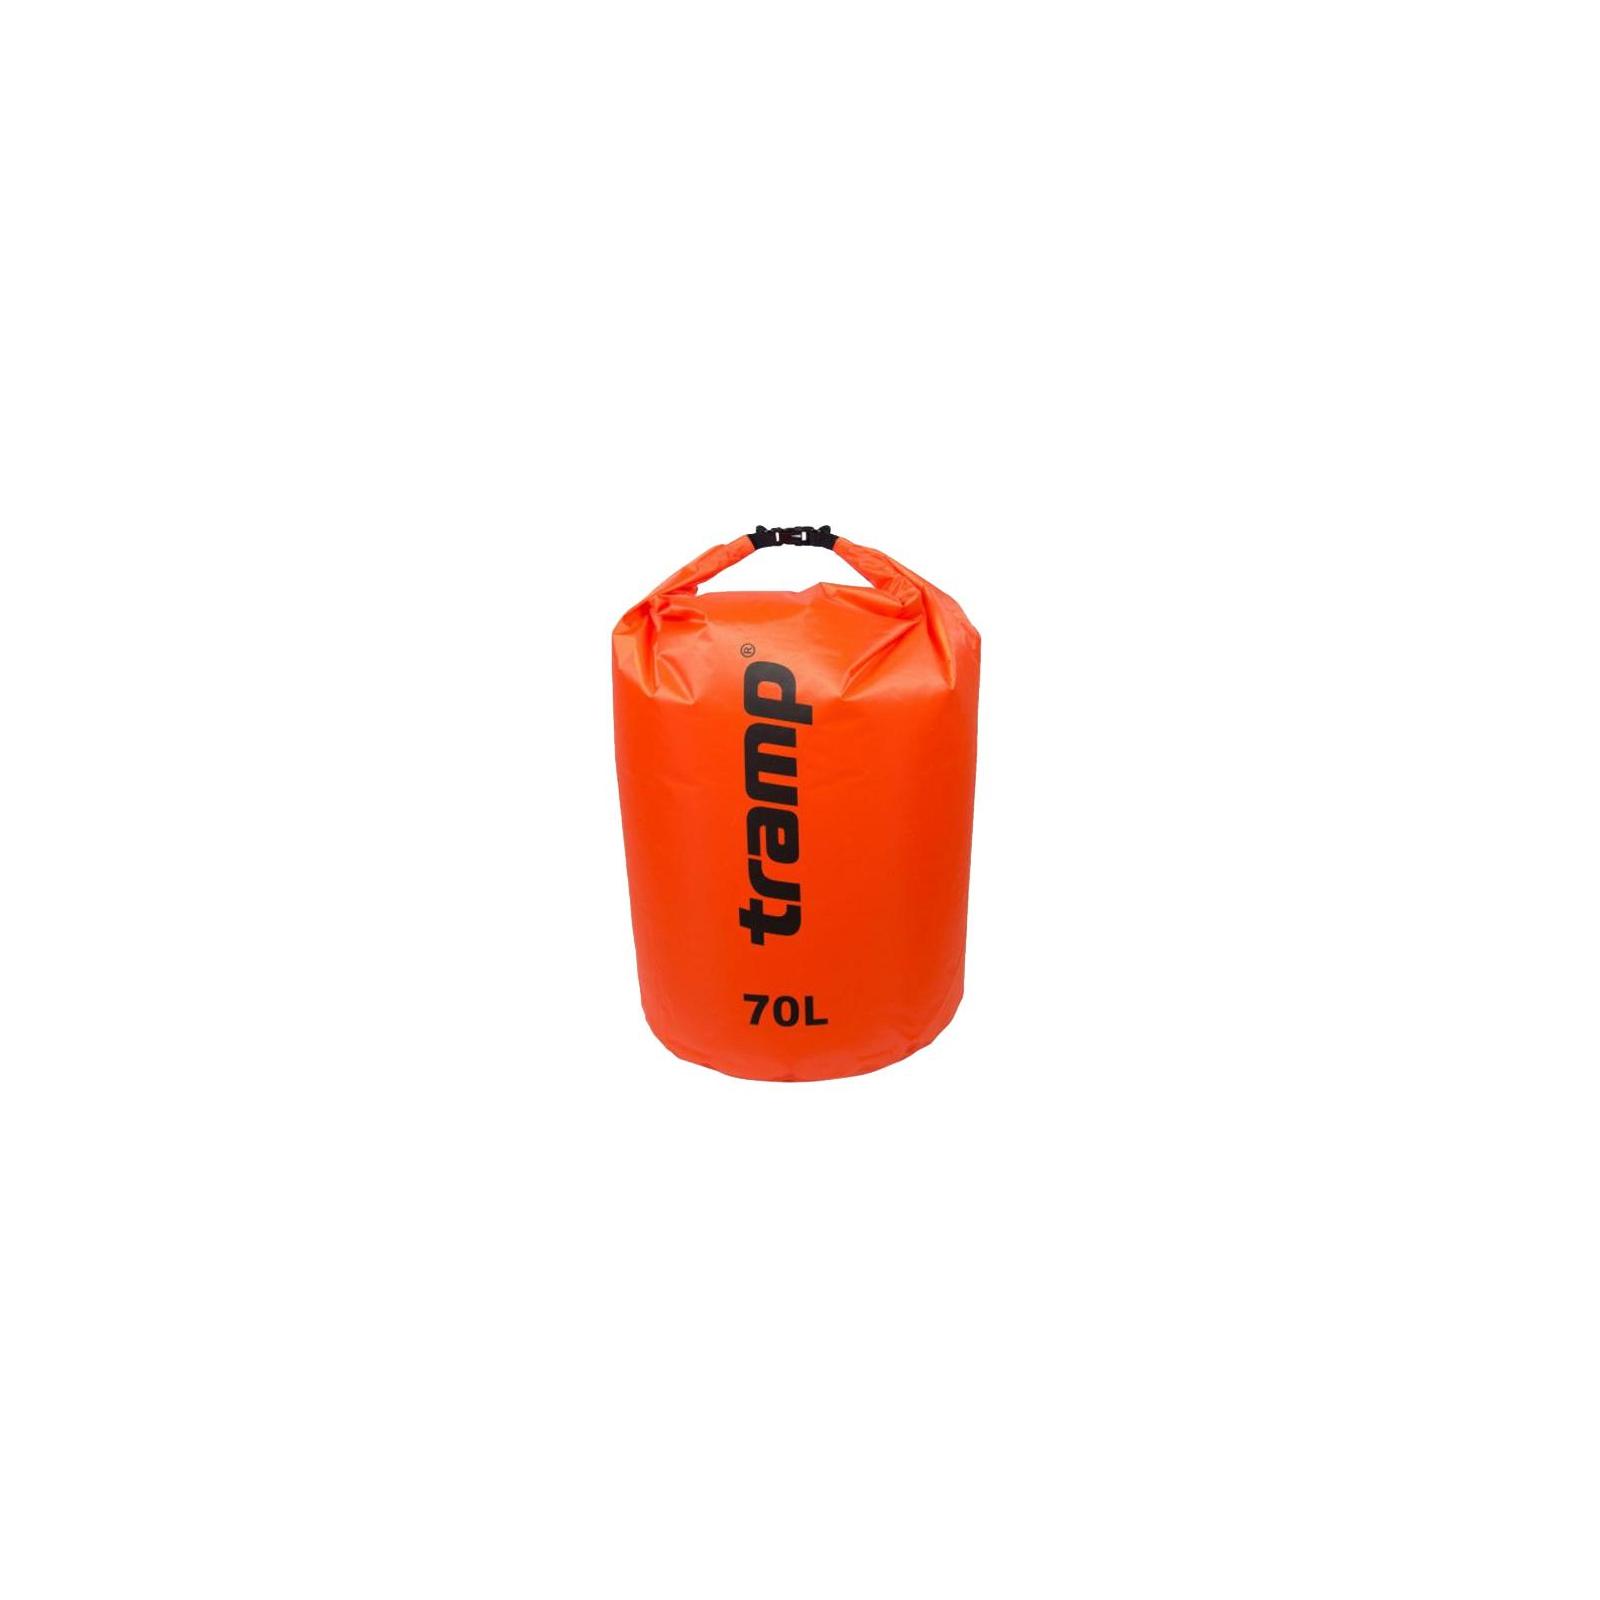 Гермомешок Tramp PVC Diamond Rip-Stop оранжевый 70л (TRA-209-orange)